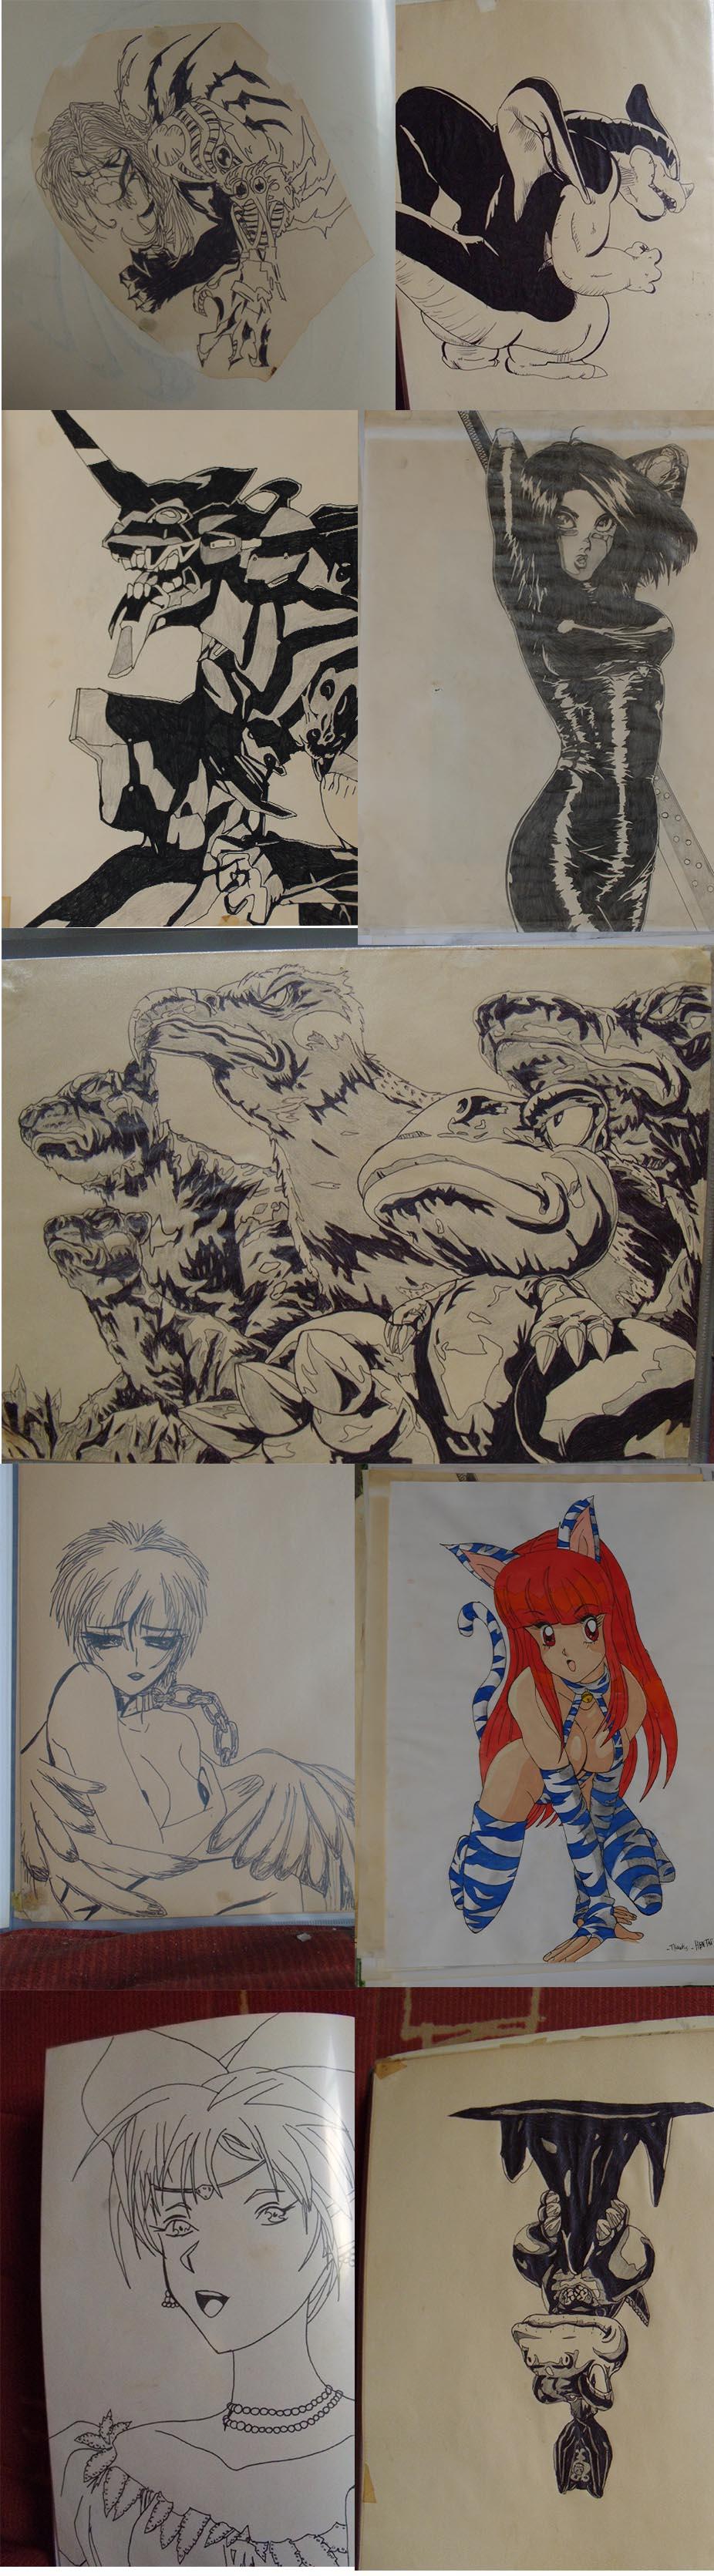 [inspi] Timeline - vos vieux dessins - Page 4 Archiv10